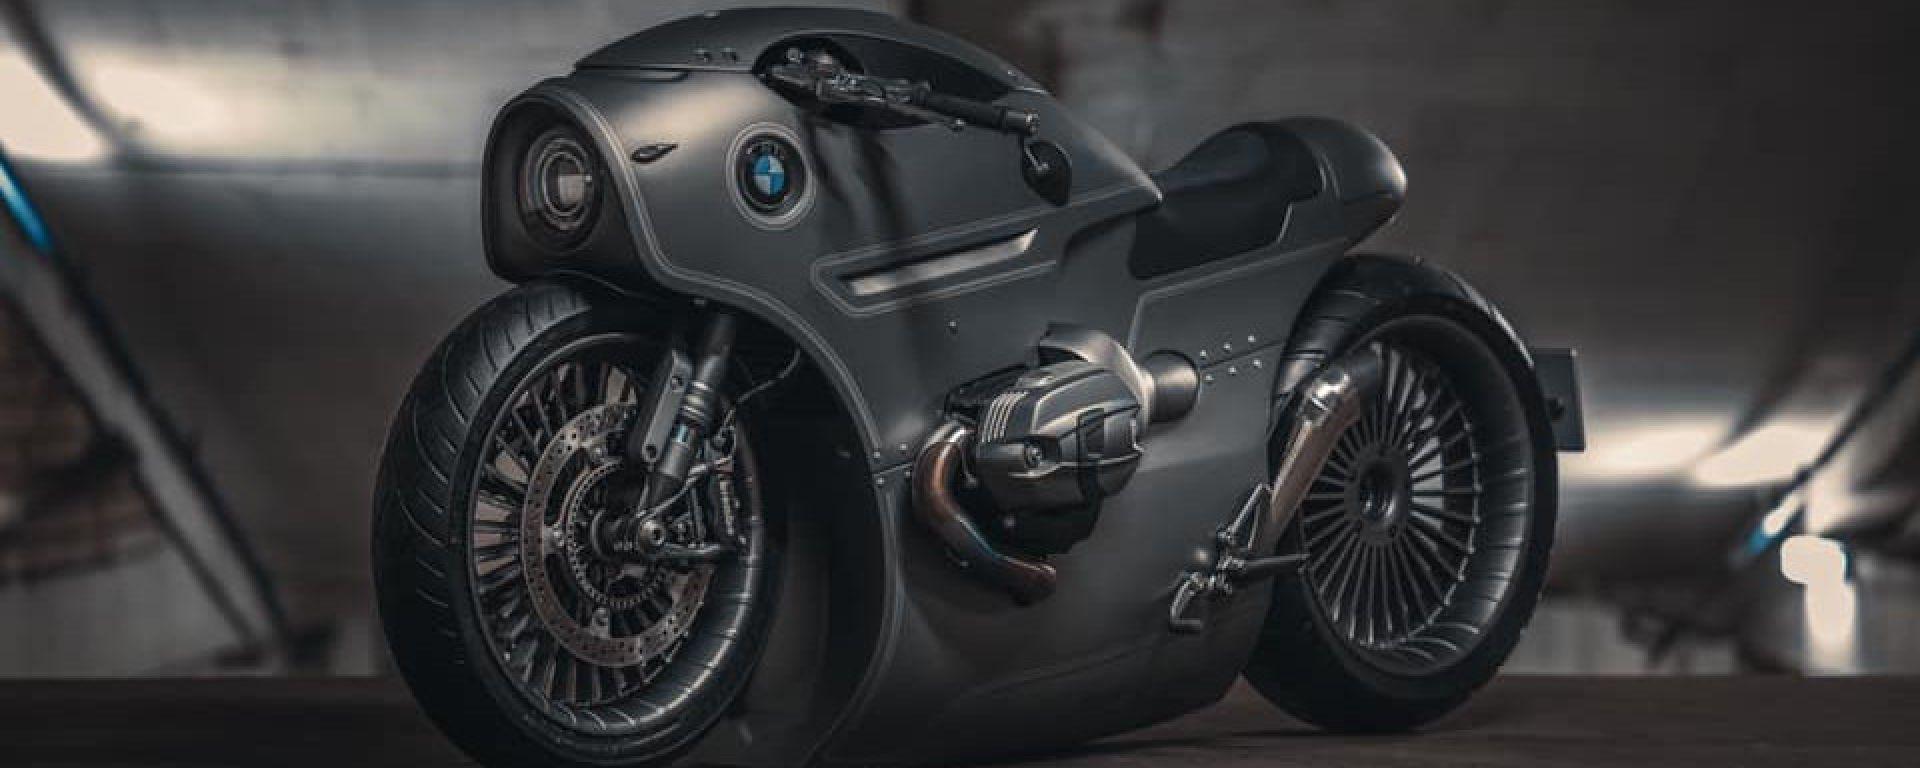 BMW R nineT Special by Zillers Custom Garage